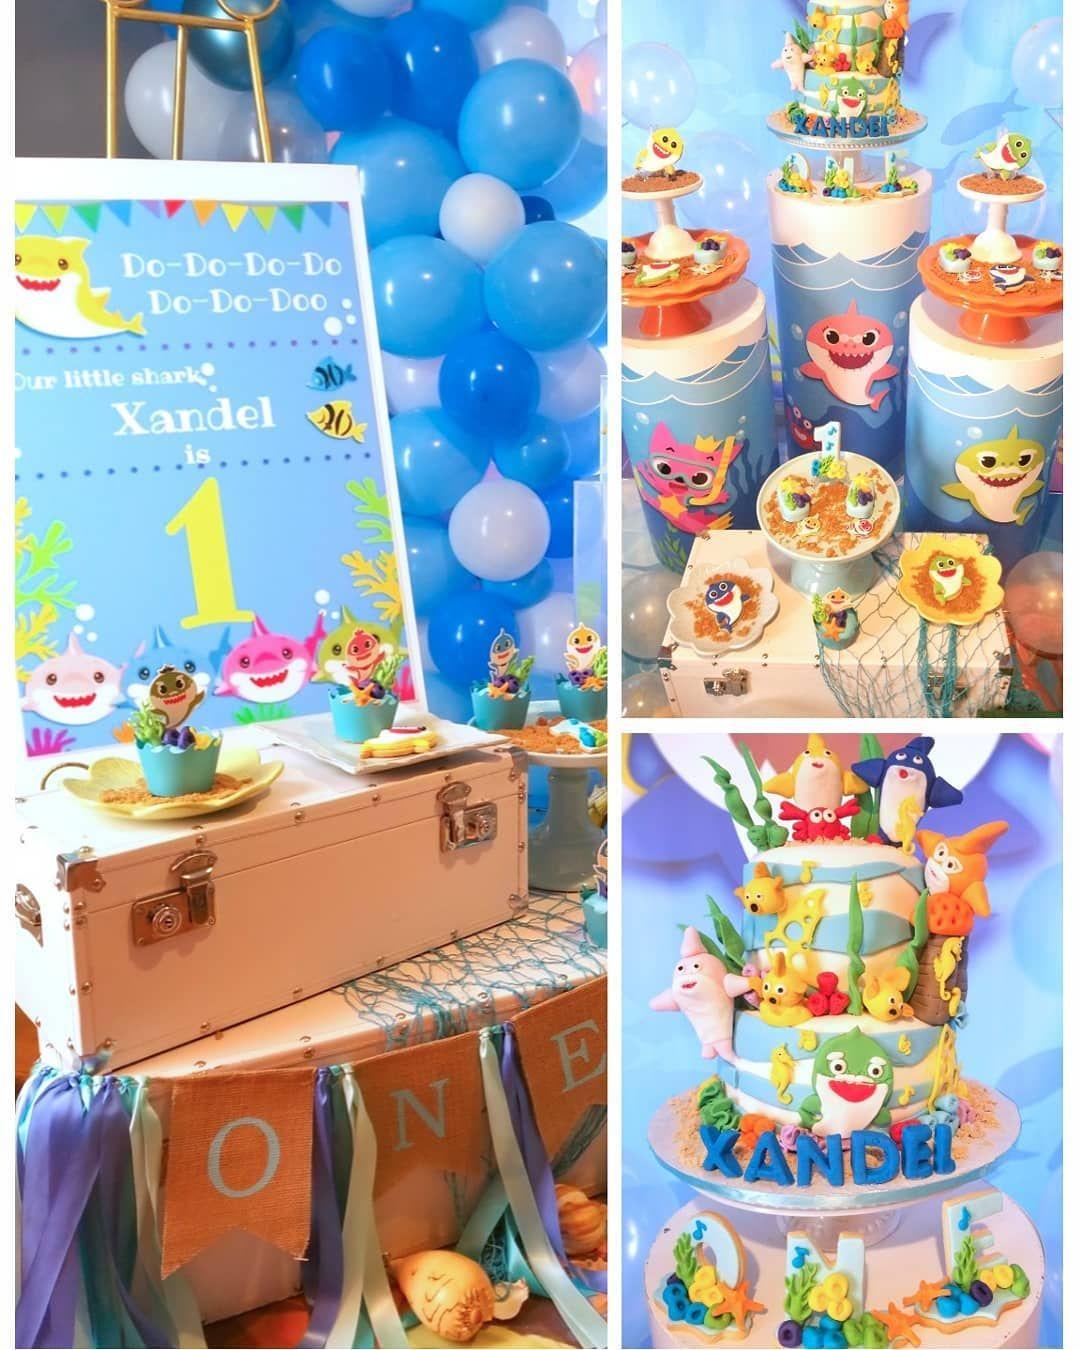 Baby Shark Theme Party Ideas | Party themes, Baby shark ...